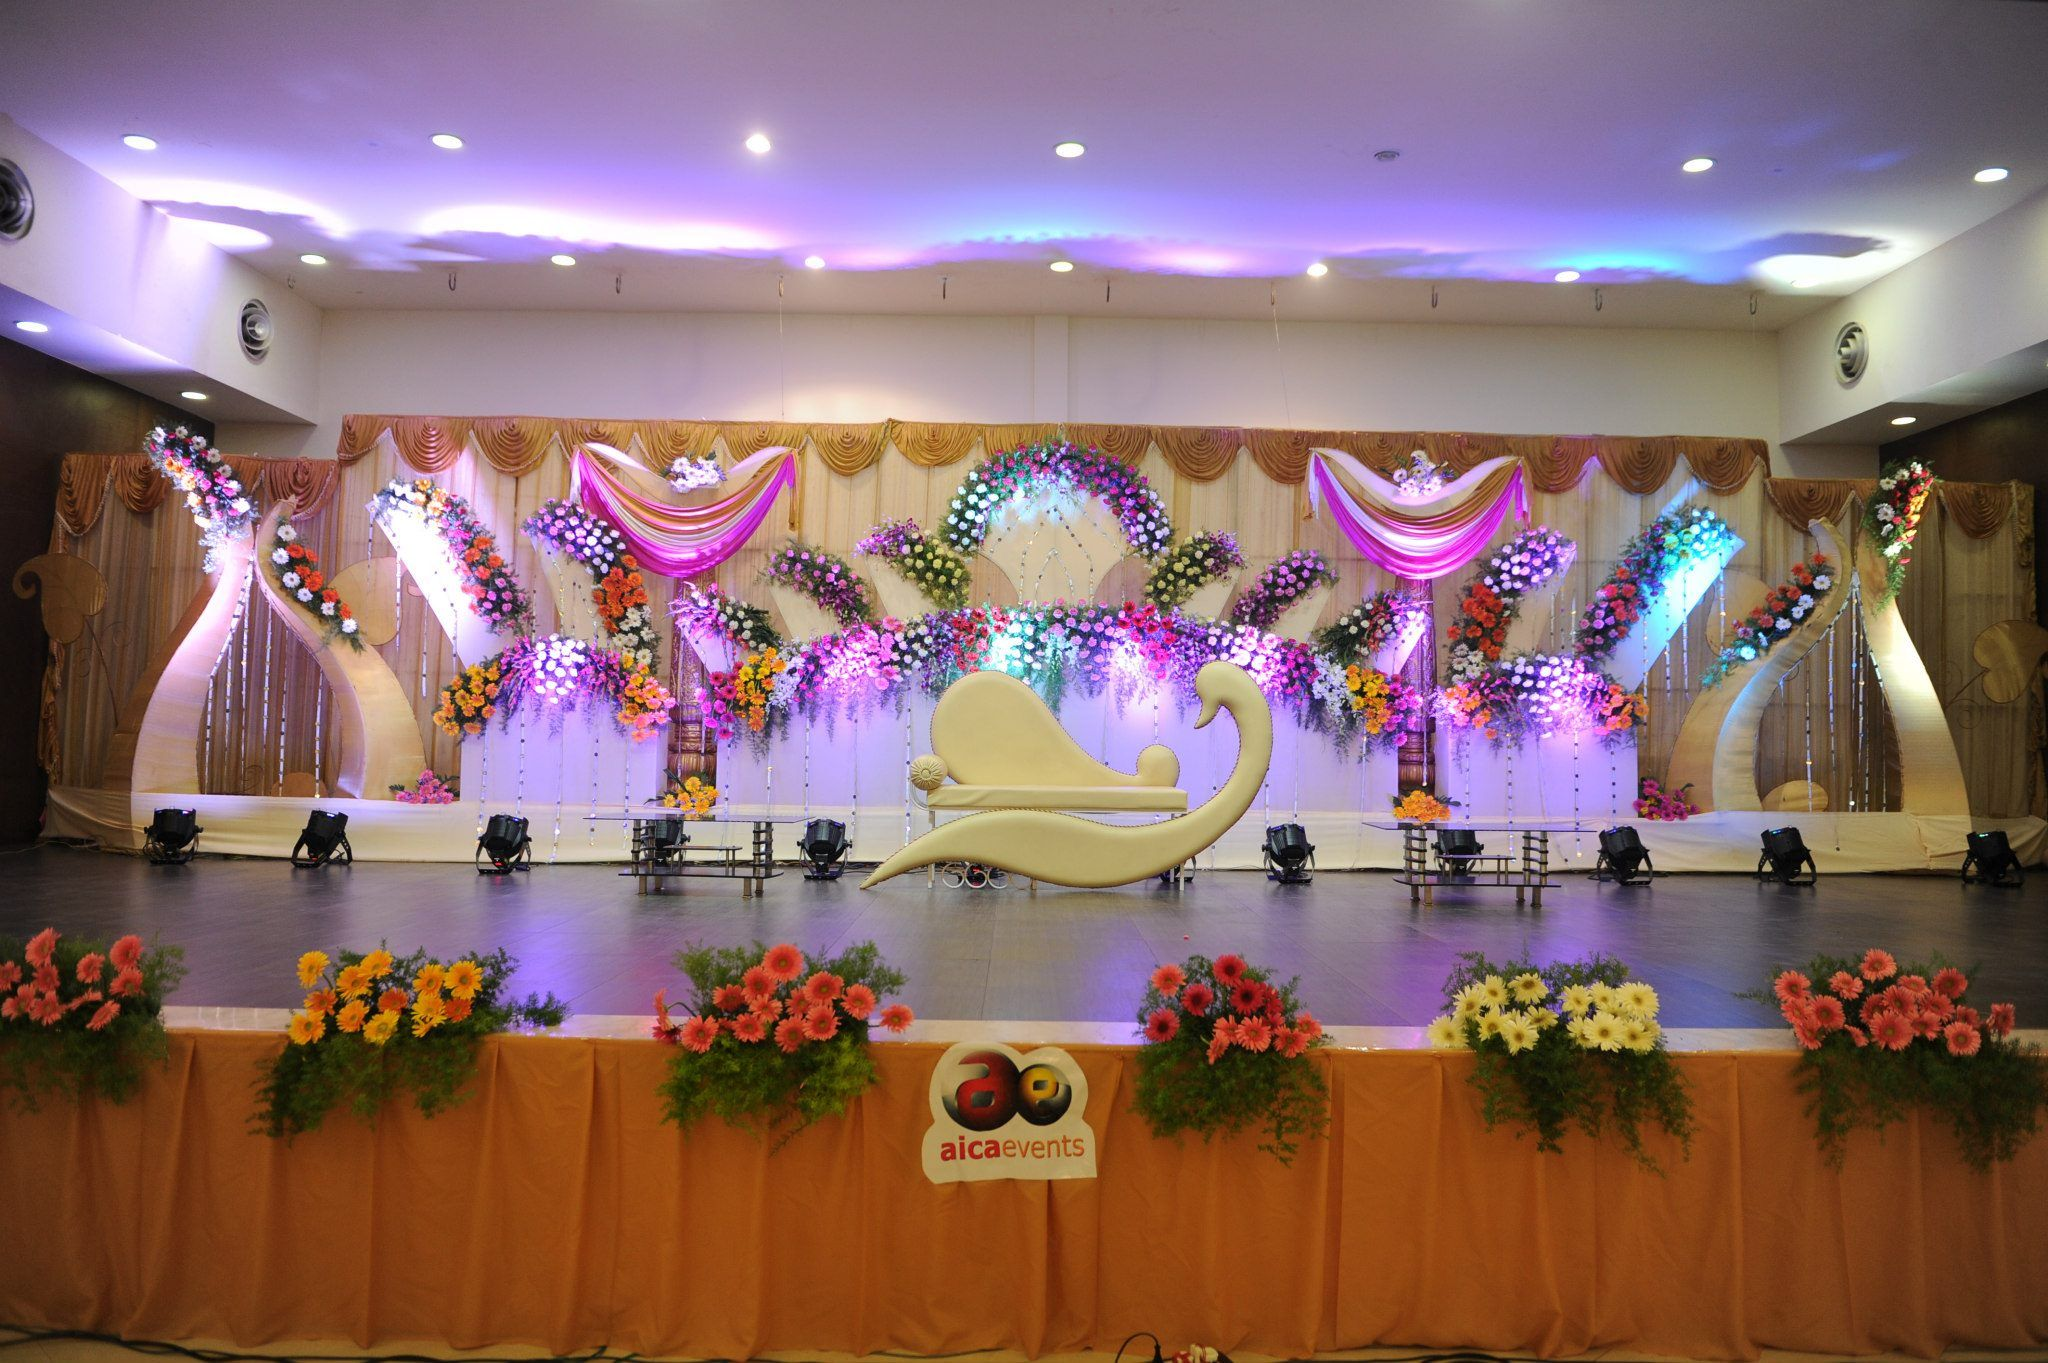 Baby naming ceremony floral backdrops google search wedding baby naming ceremony floral backdrops google search junglespirit Choice Image